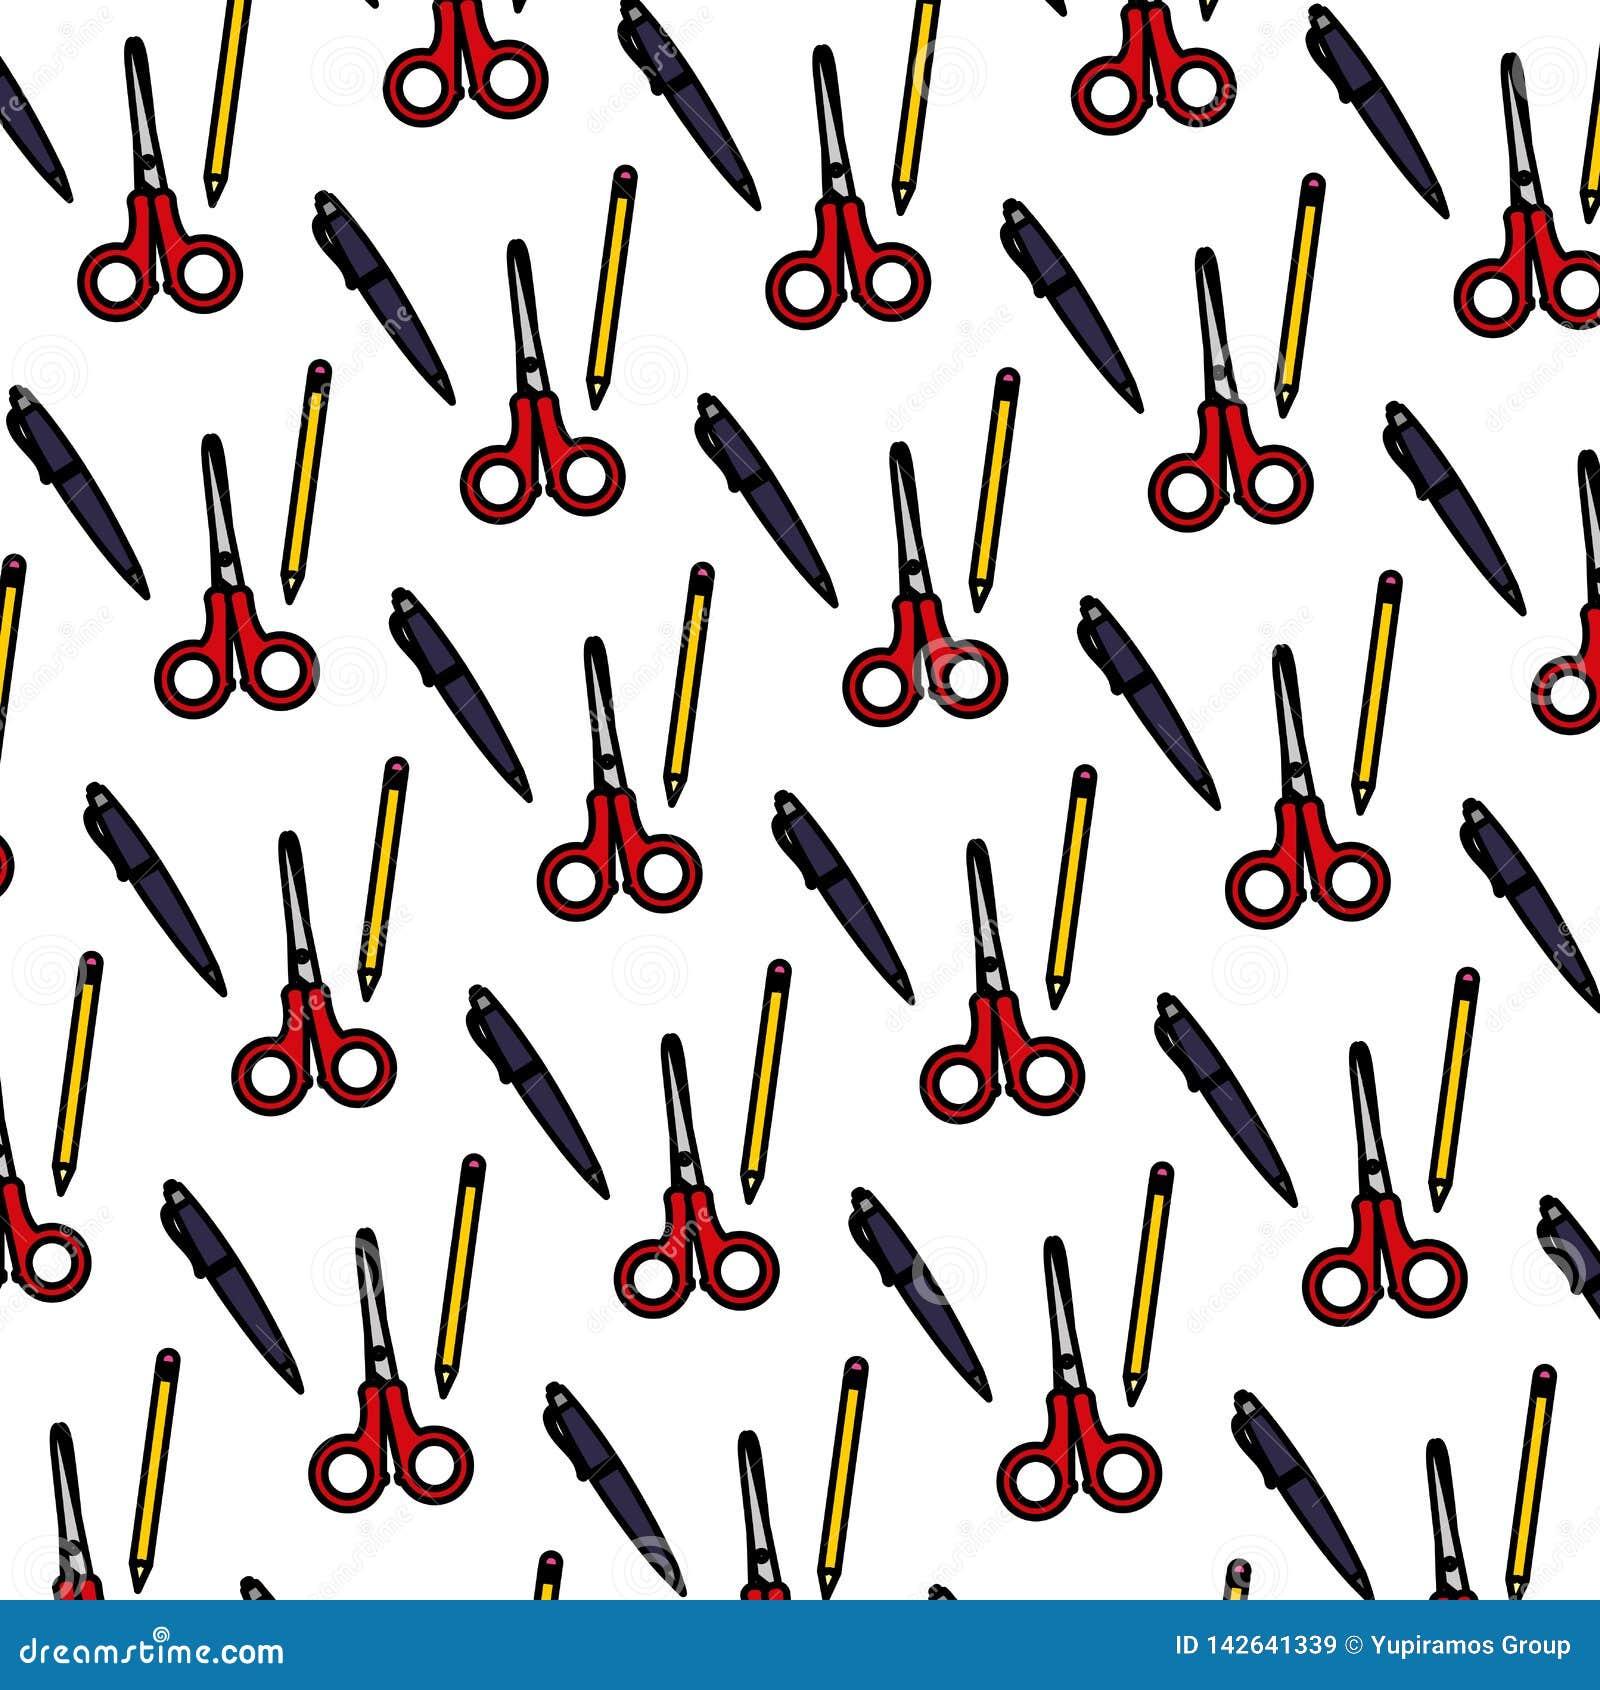 Color Scissors And Pen School Tools Background Stock ...